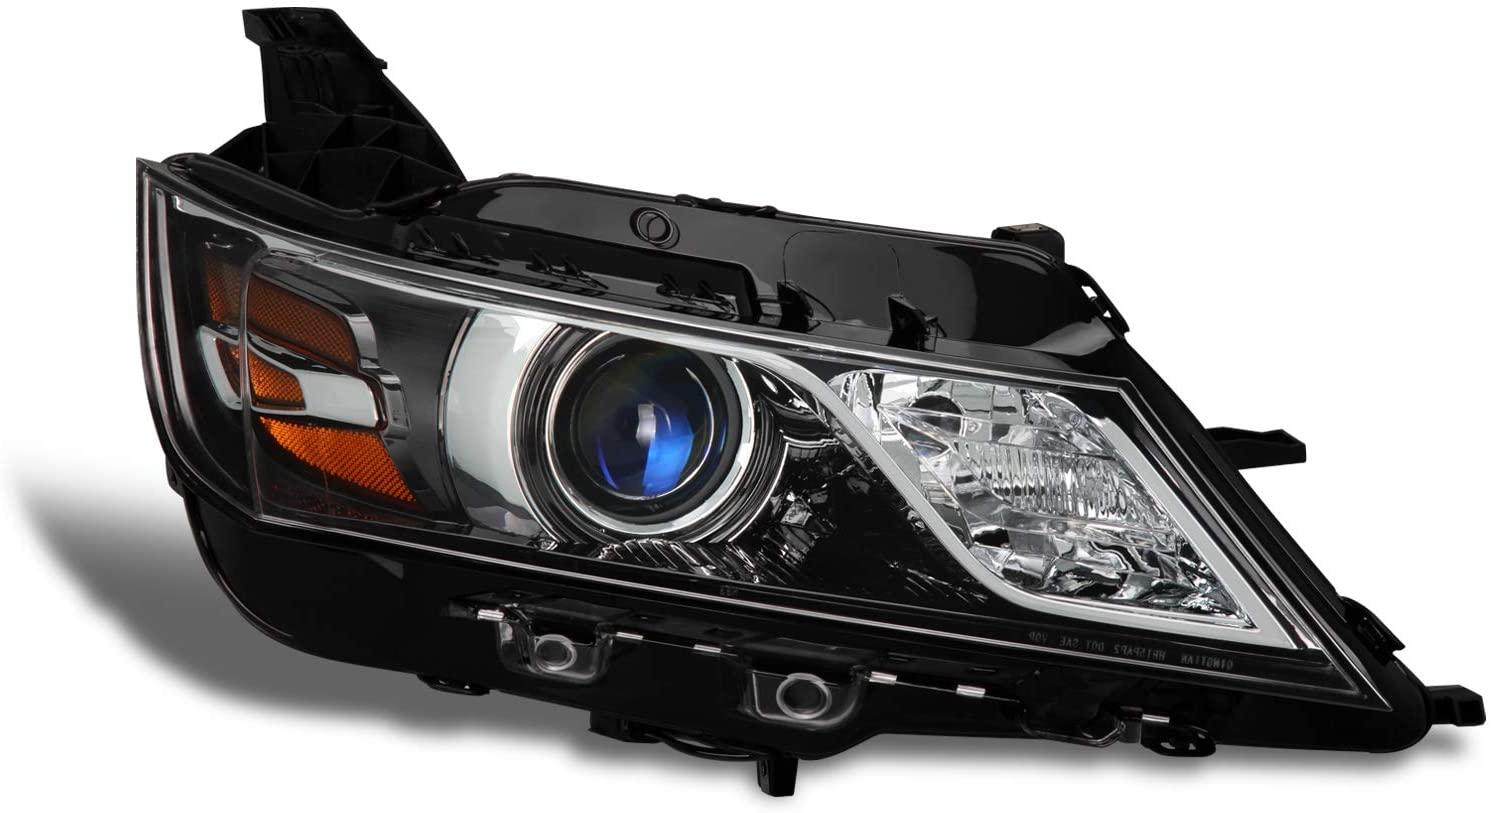 Fits 2014 2015 2016 2017 2018 2019 2020 Chevy Impala [Halogen Style] Projector Black Headlight Passenger Right Side Headlamp